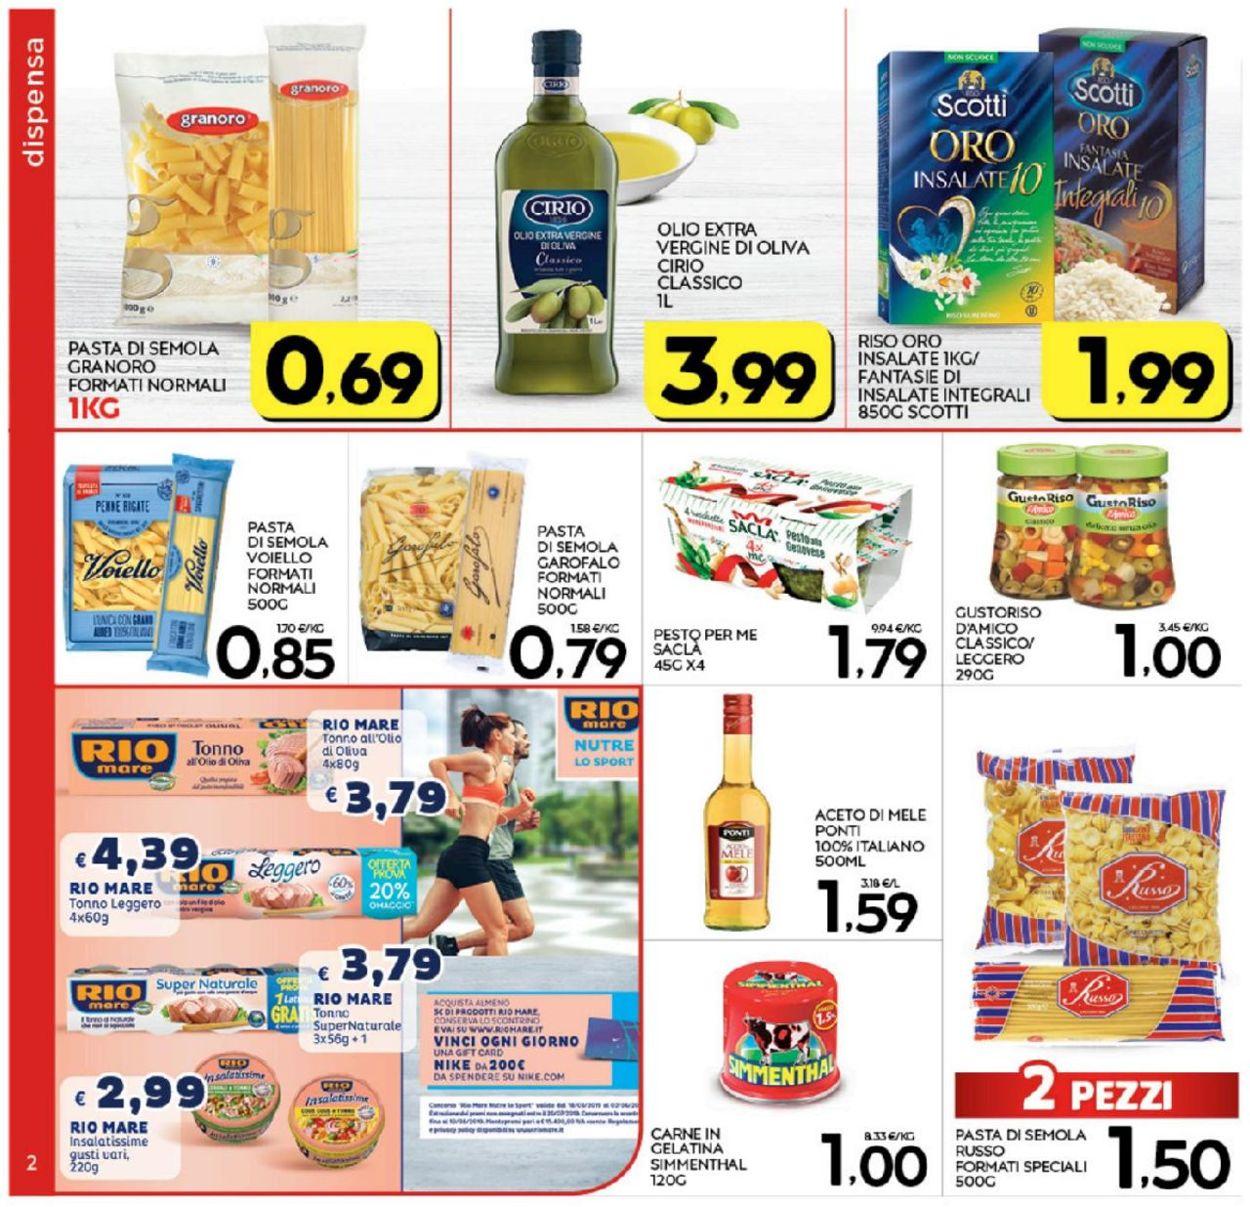 Volantino Interspar - Offerte 16/05-26/05/2019 (Pagina 2)